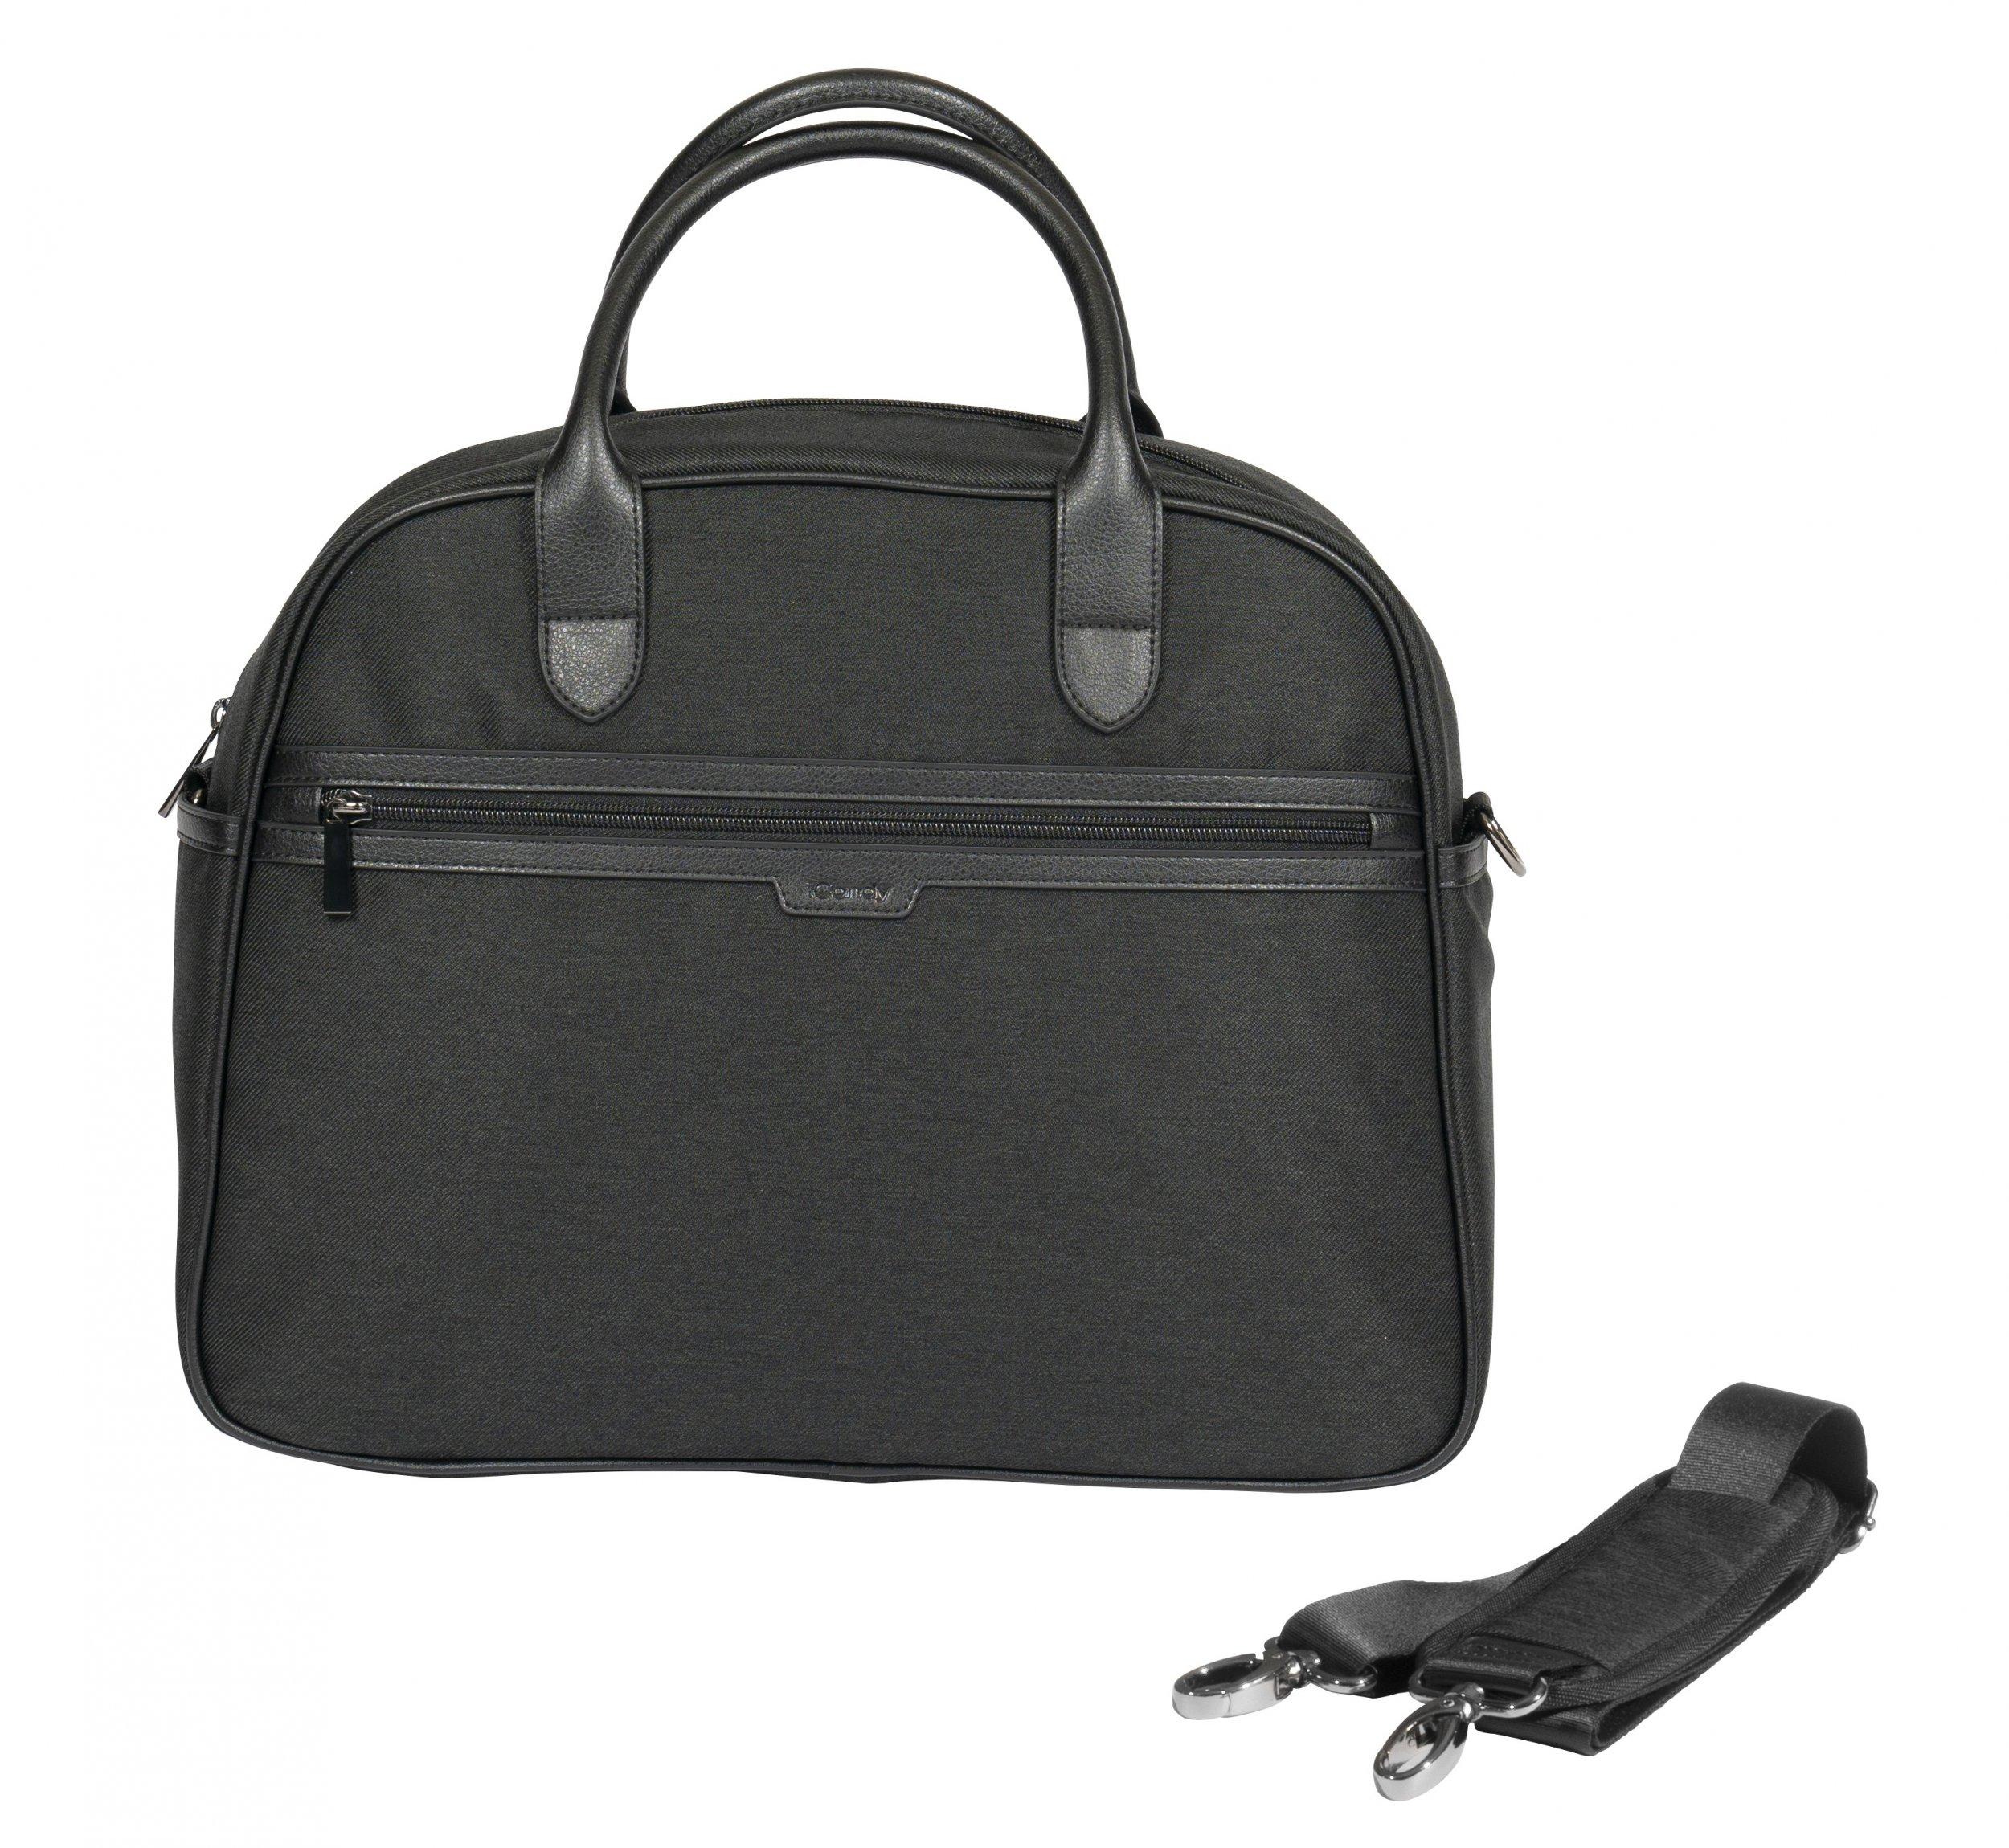 iCandy Peach Changing Bag & Bag Hook - Black Twill